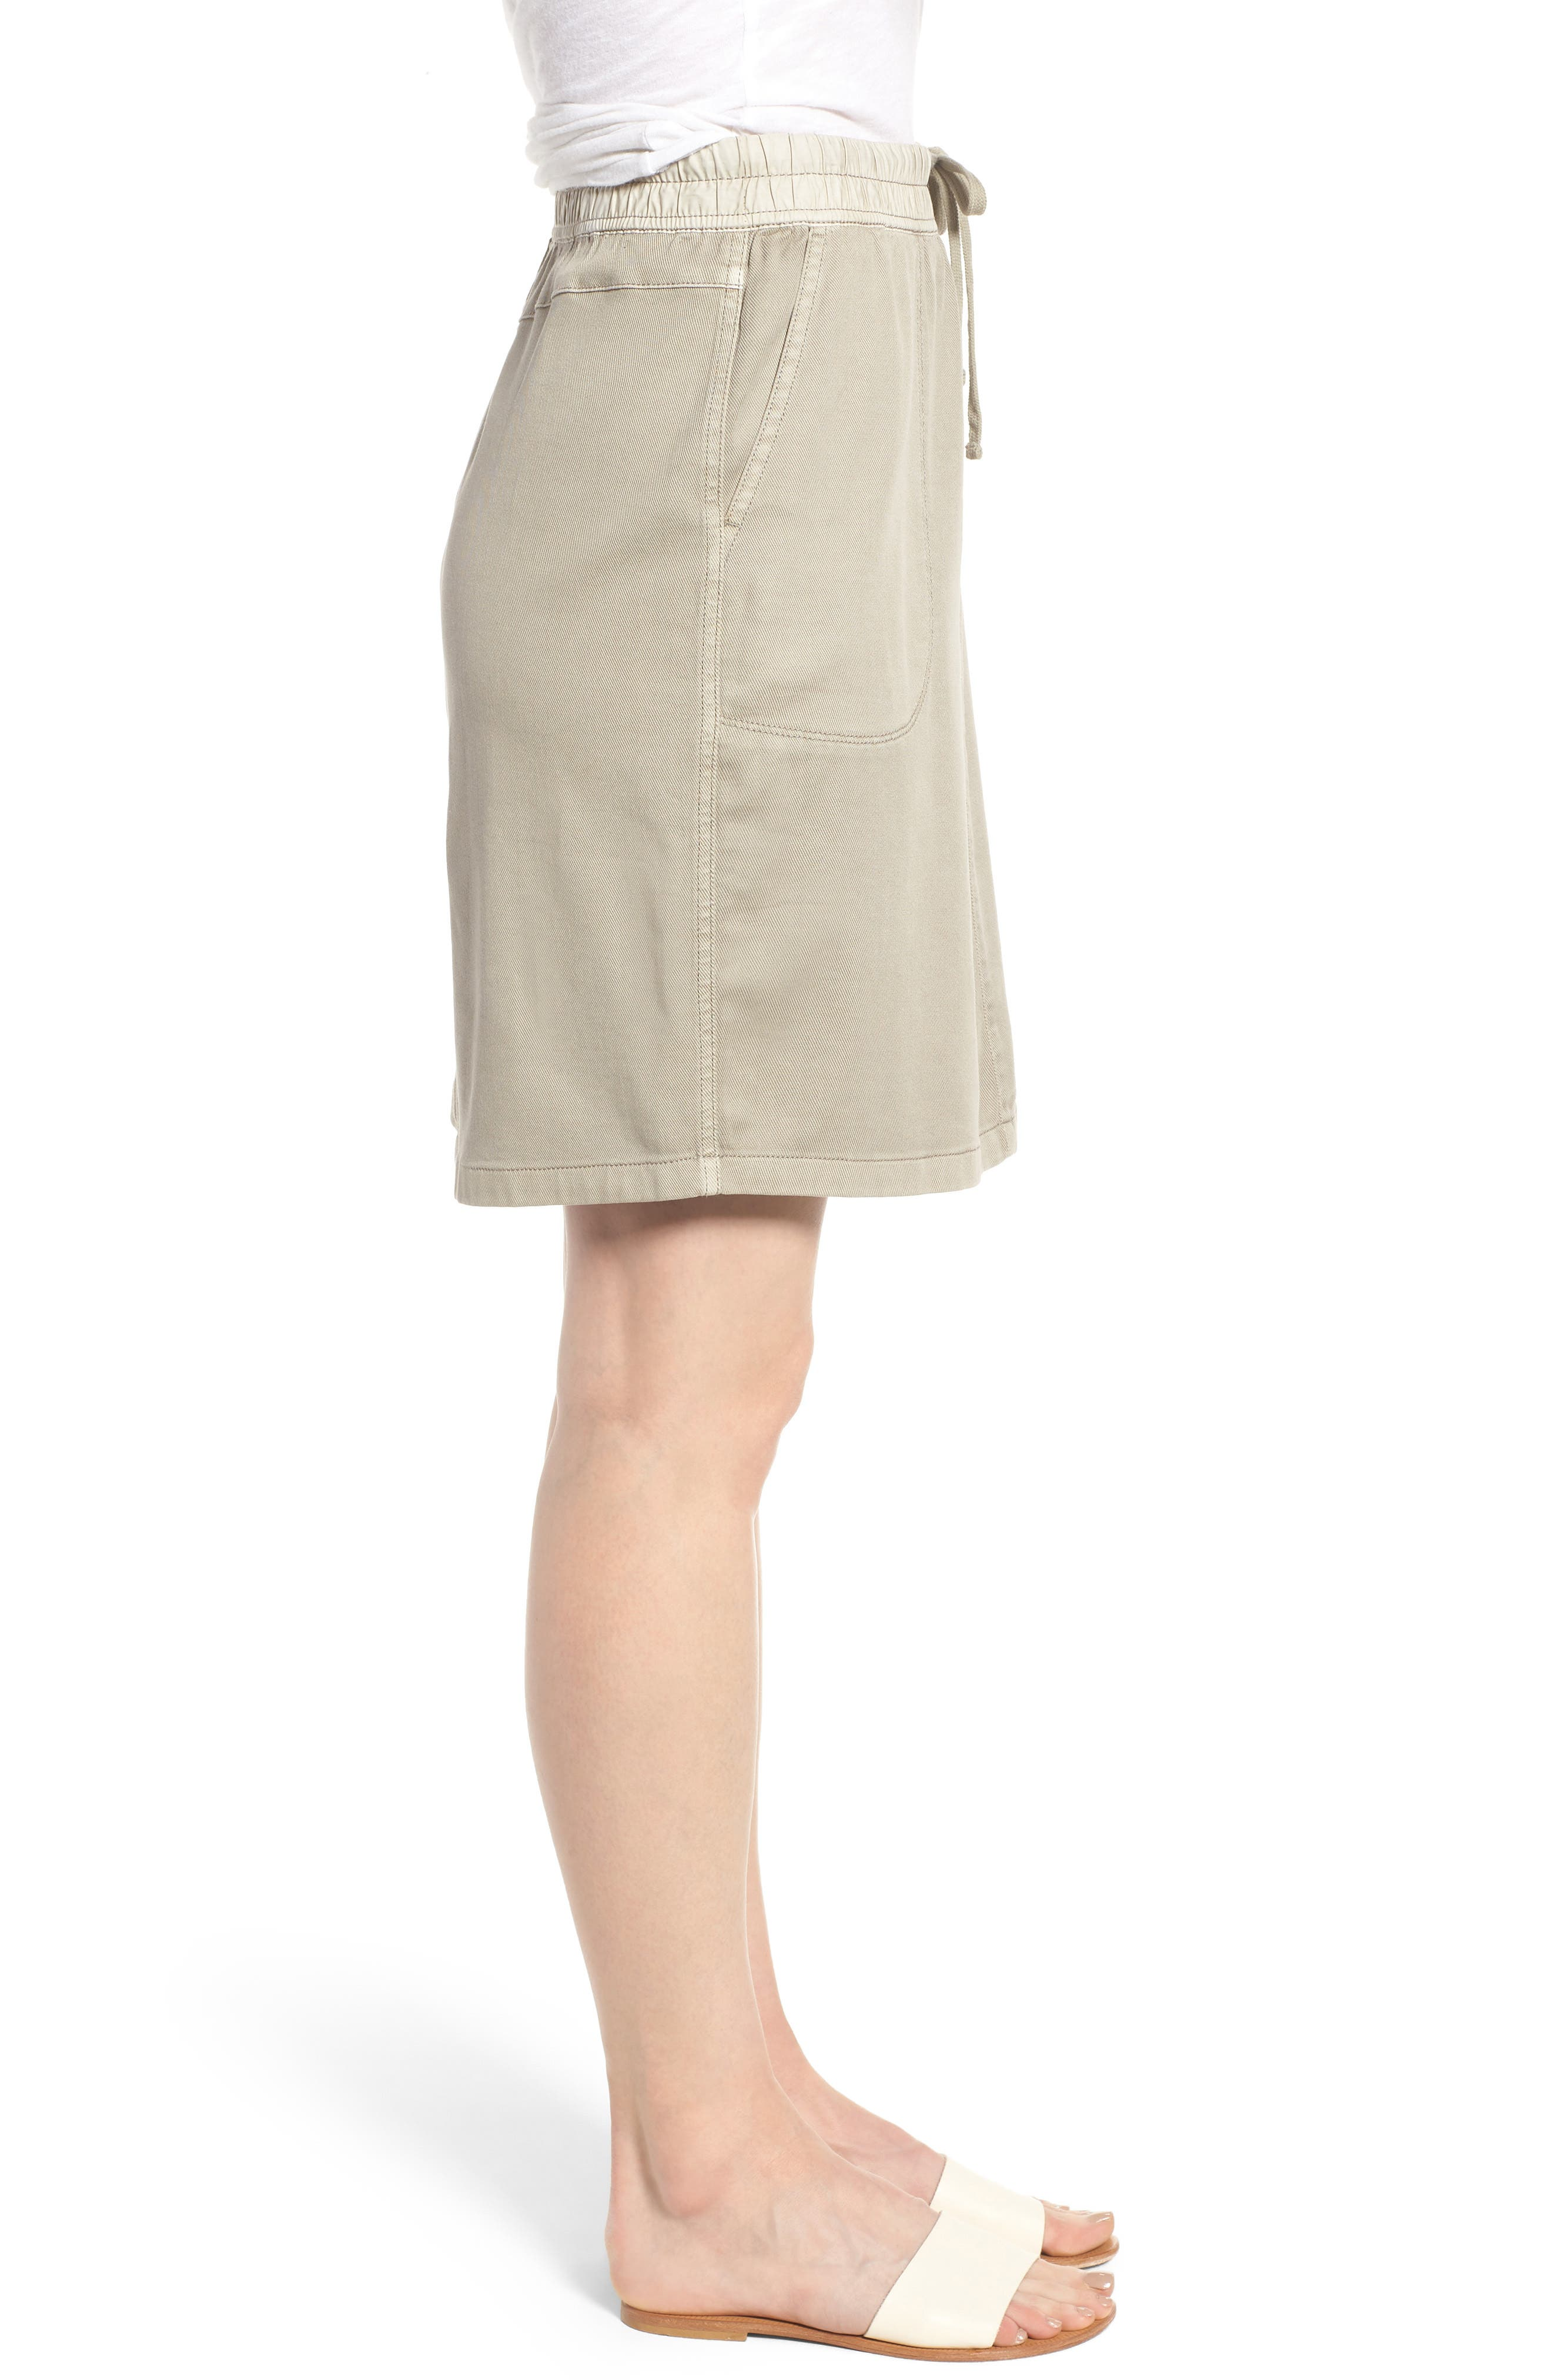 Open Road Skirt,                             Alternate thumbnail 3, color,                             FLAX